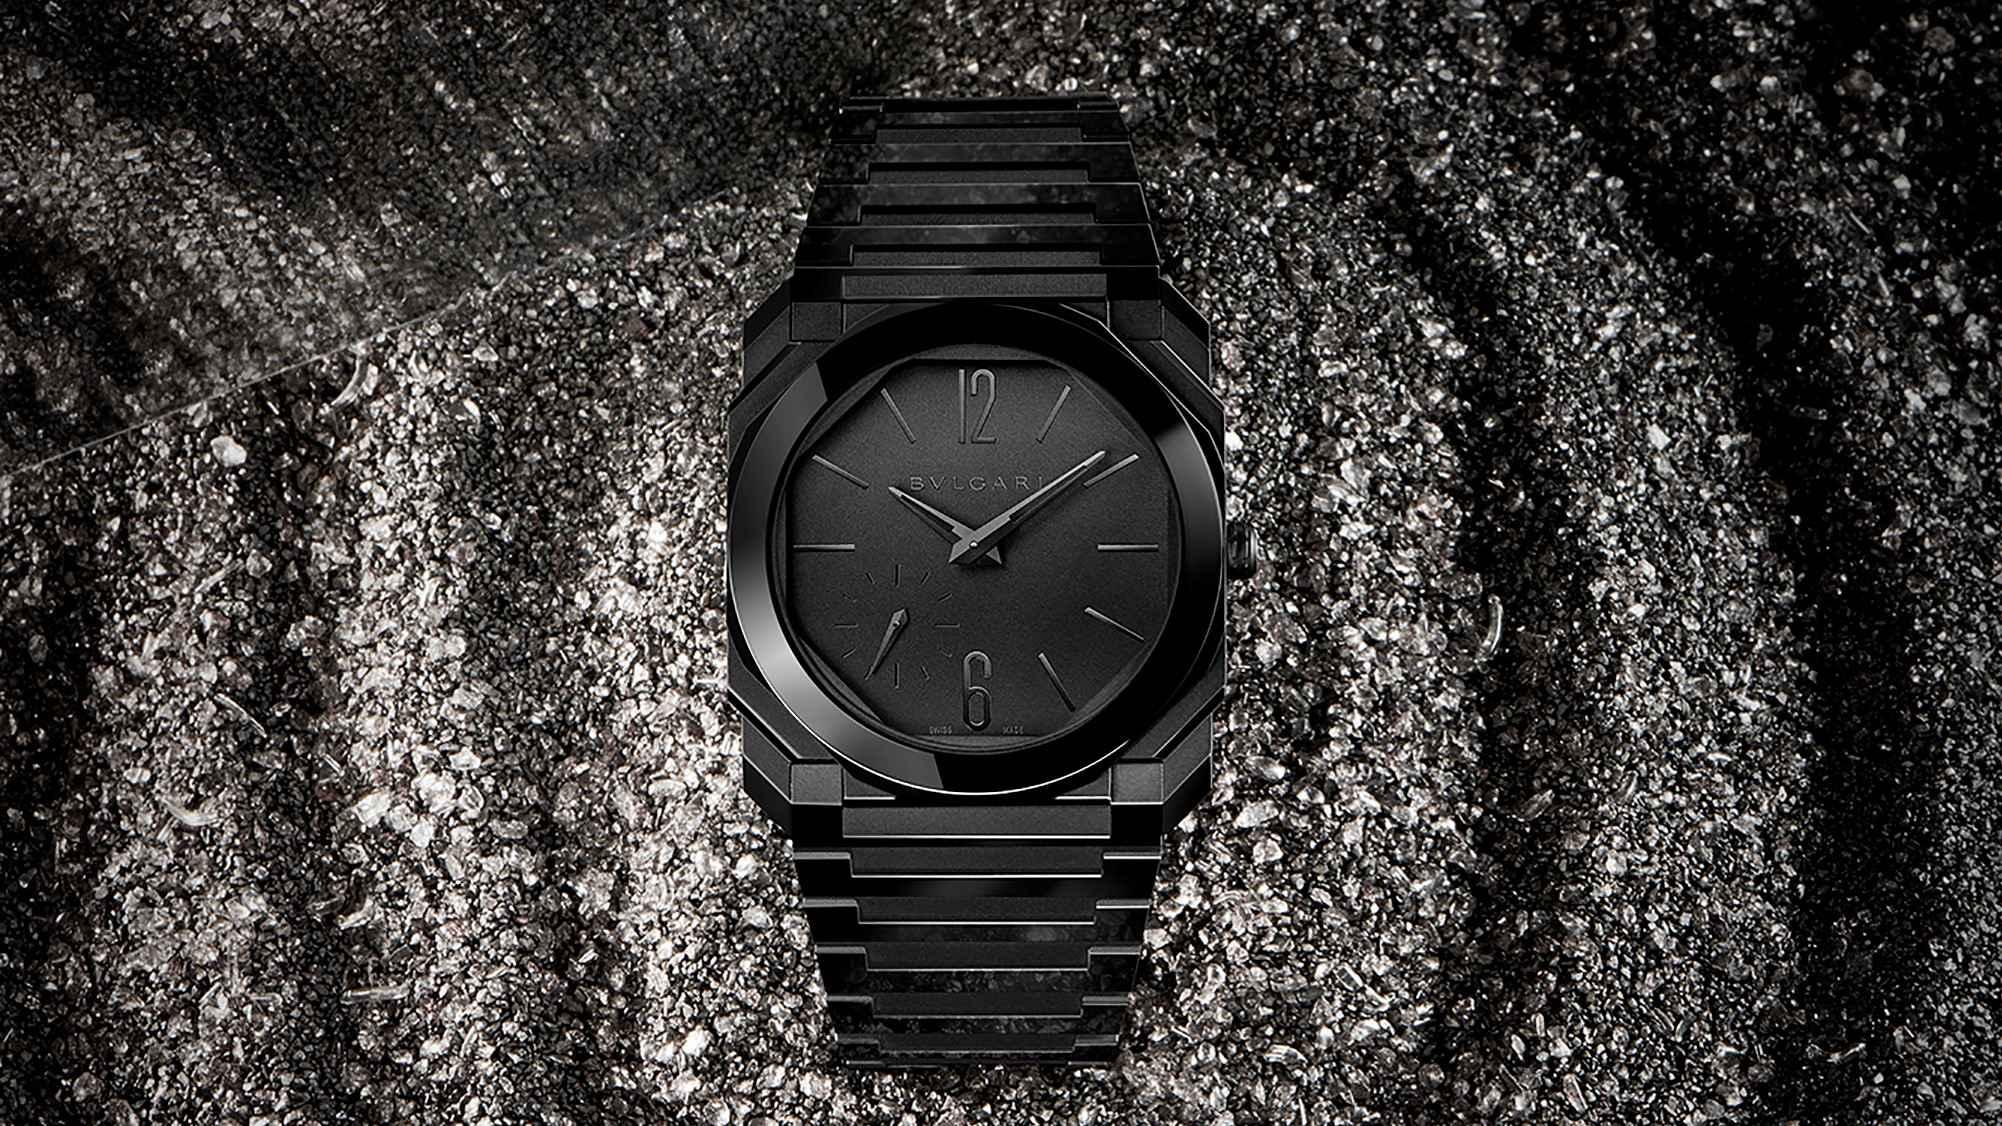 1_宝格丽Octo Finissimo Automatic黑色喷砂抛光陶瓷腕表.jpg